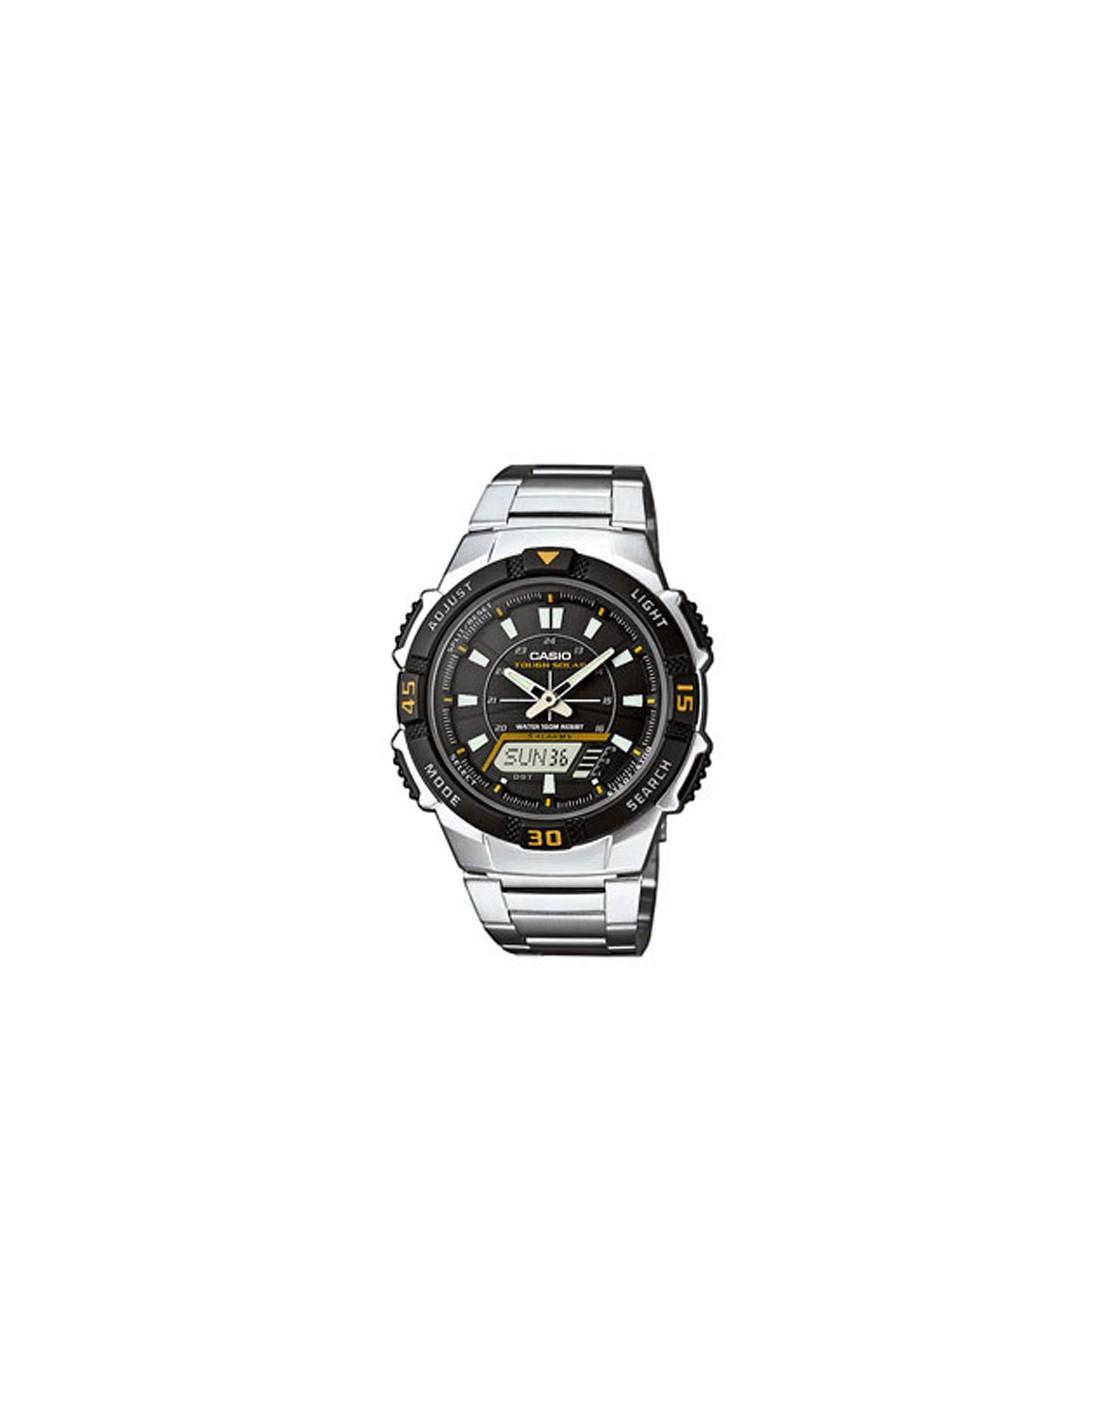 Reloj Casio Collection AQ-S800WD-1EVEF cf5412378cce